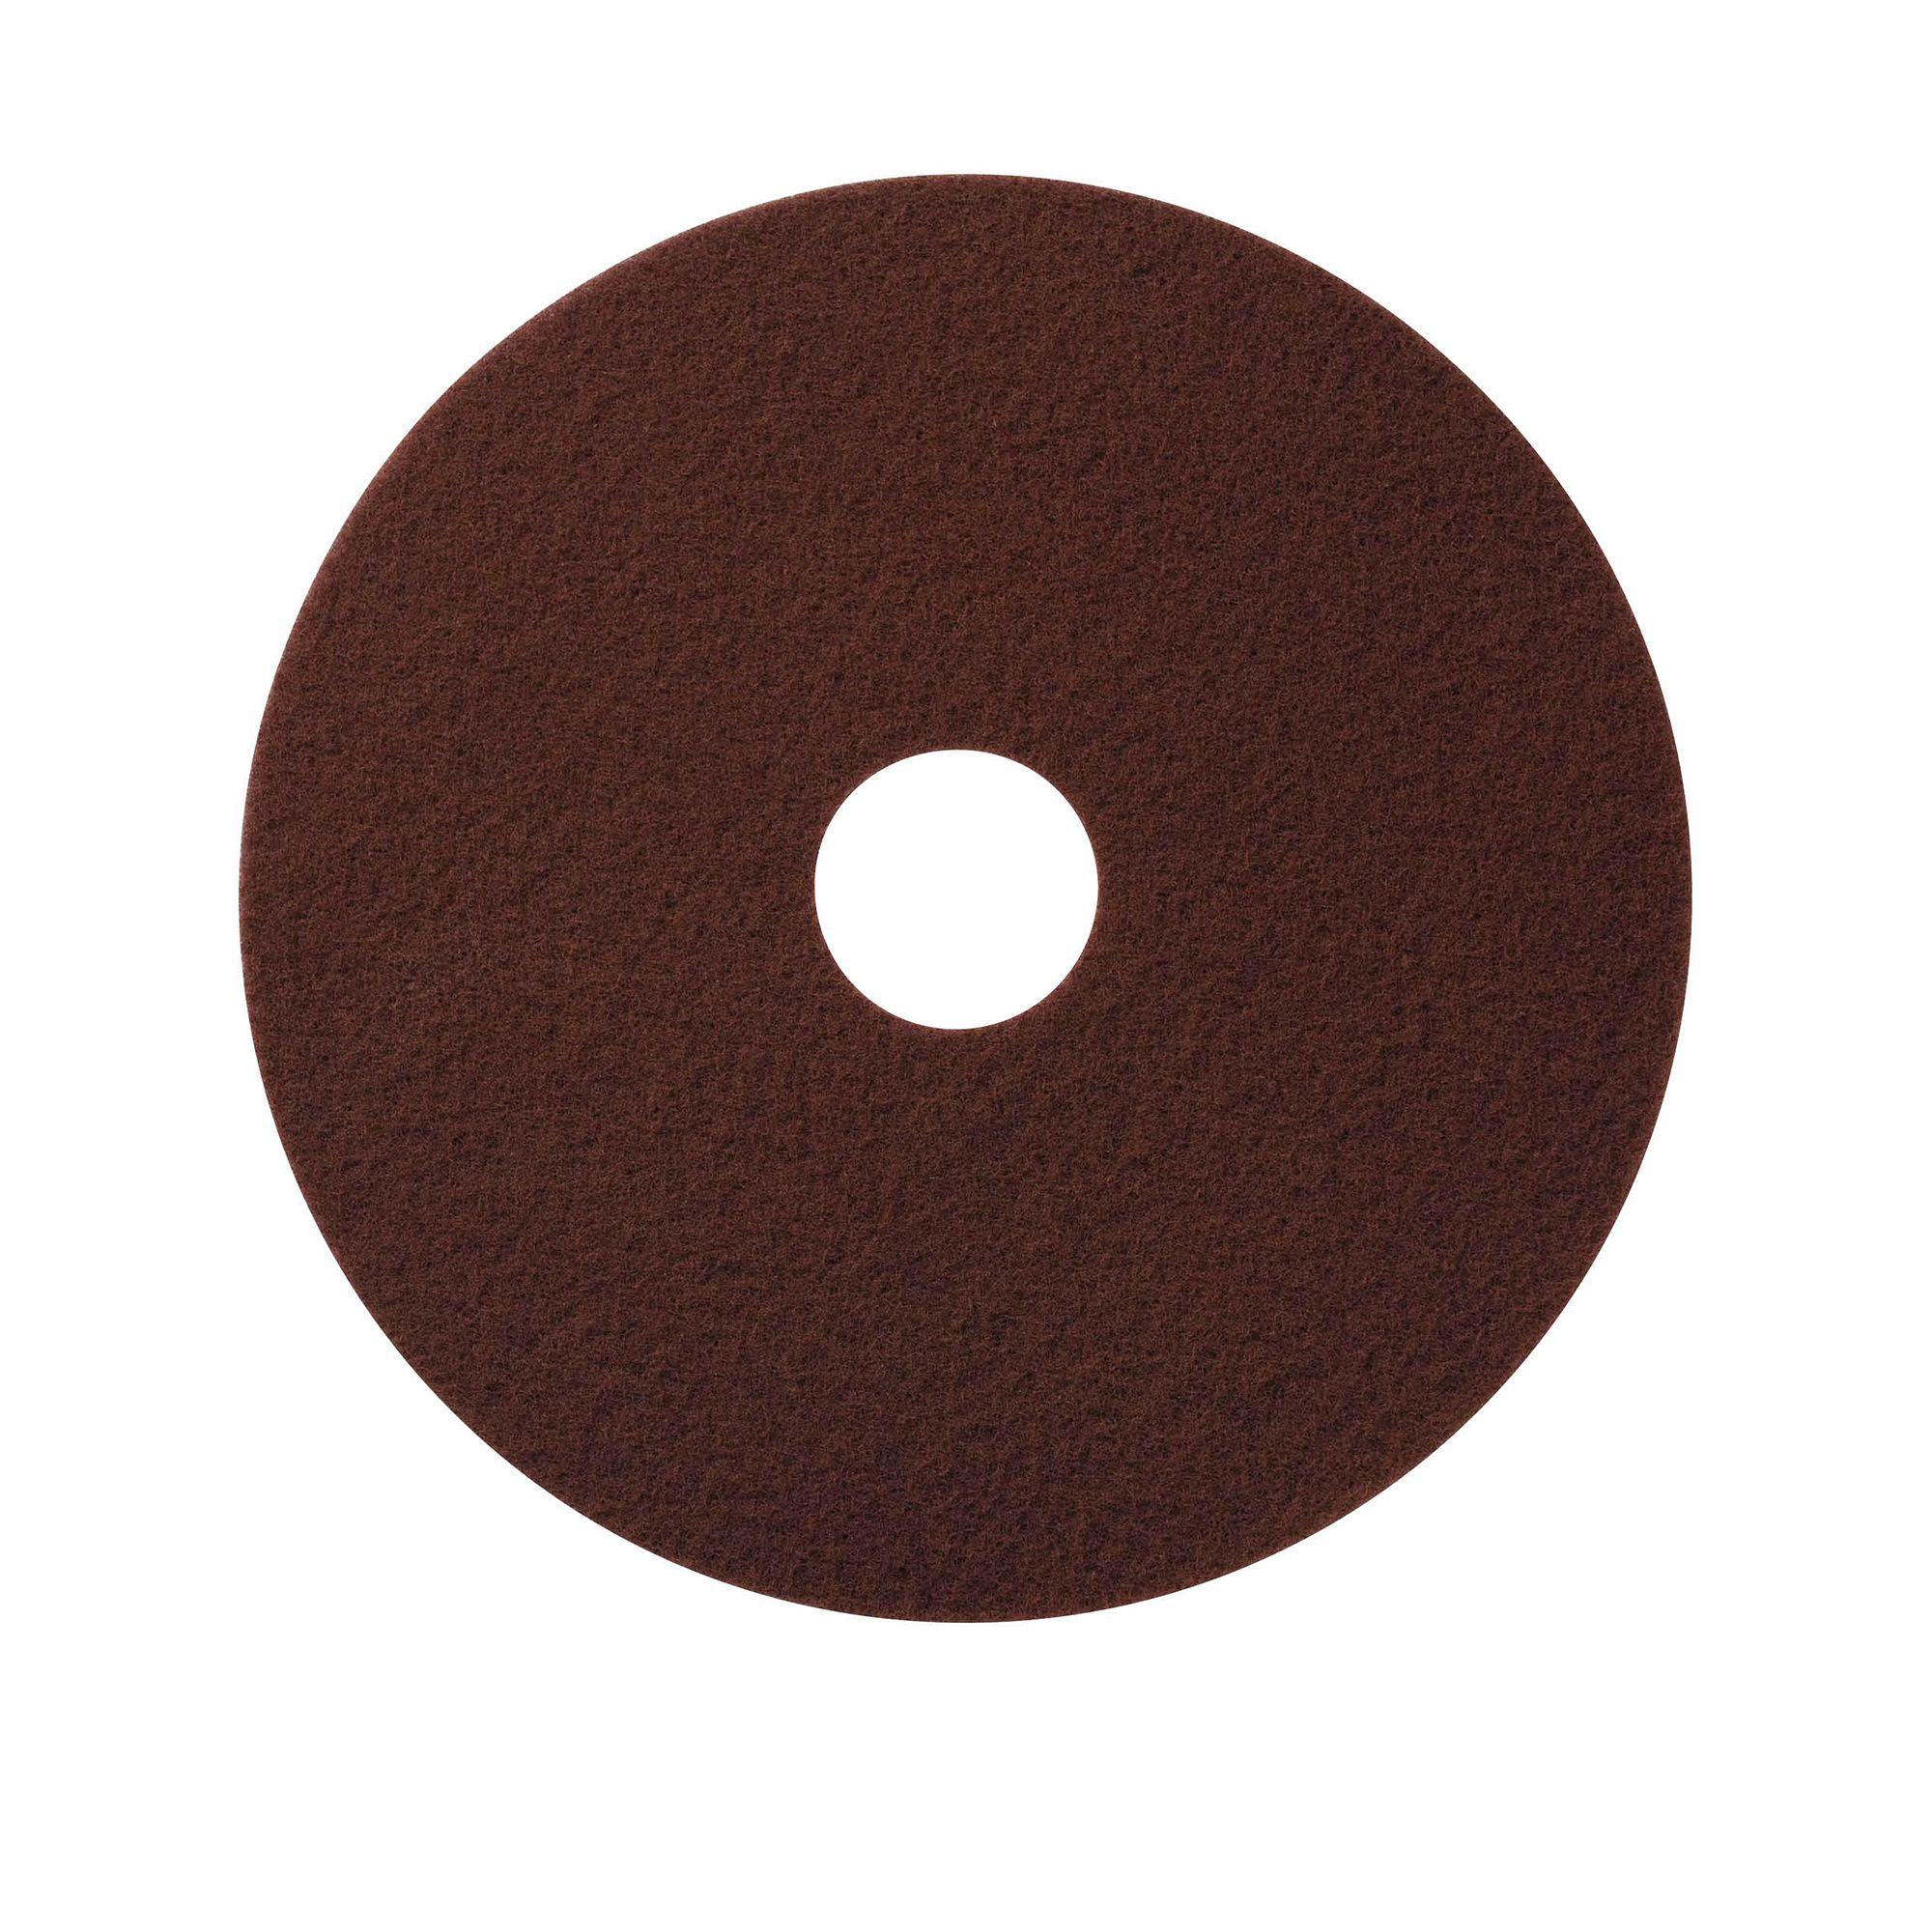 NuPad bruin (strippen zonder chemie), per 10 stuks, 17 inch / 432 mm